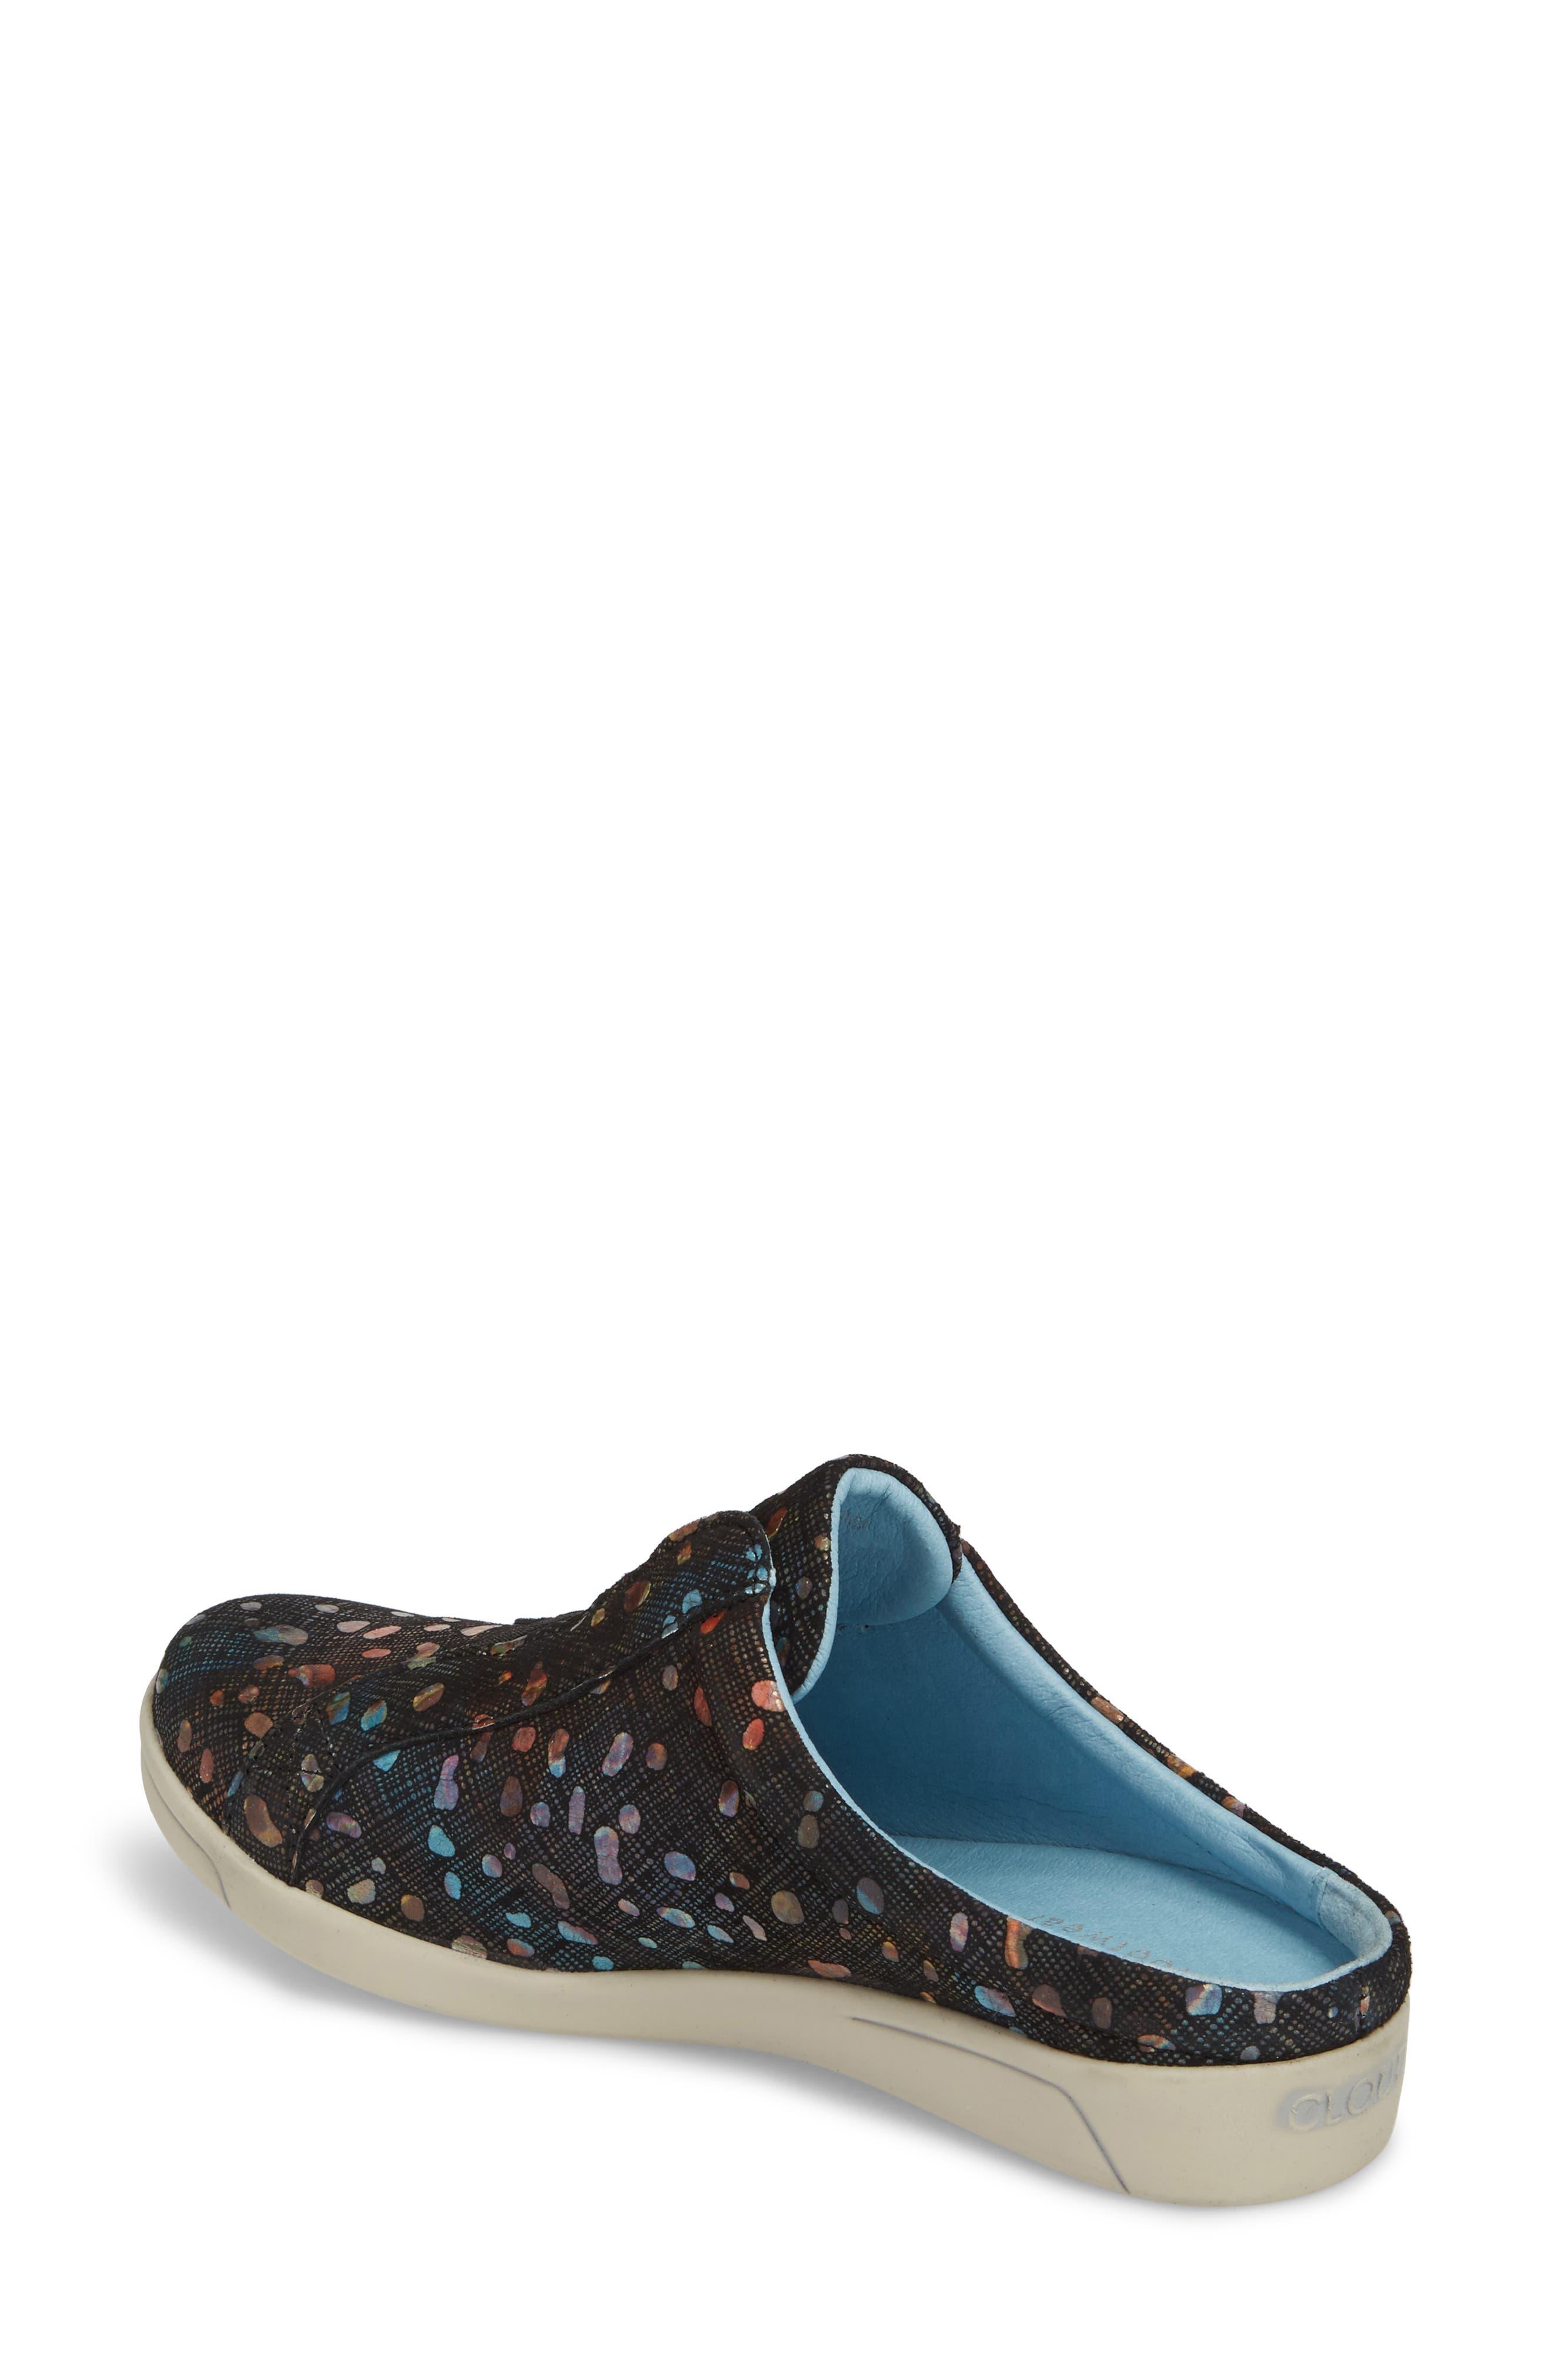 Arizona Fantasy Mule Sneaker,                             Alternate thumbnail 2, color,                             Bubble Leather